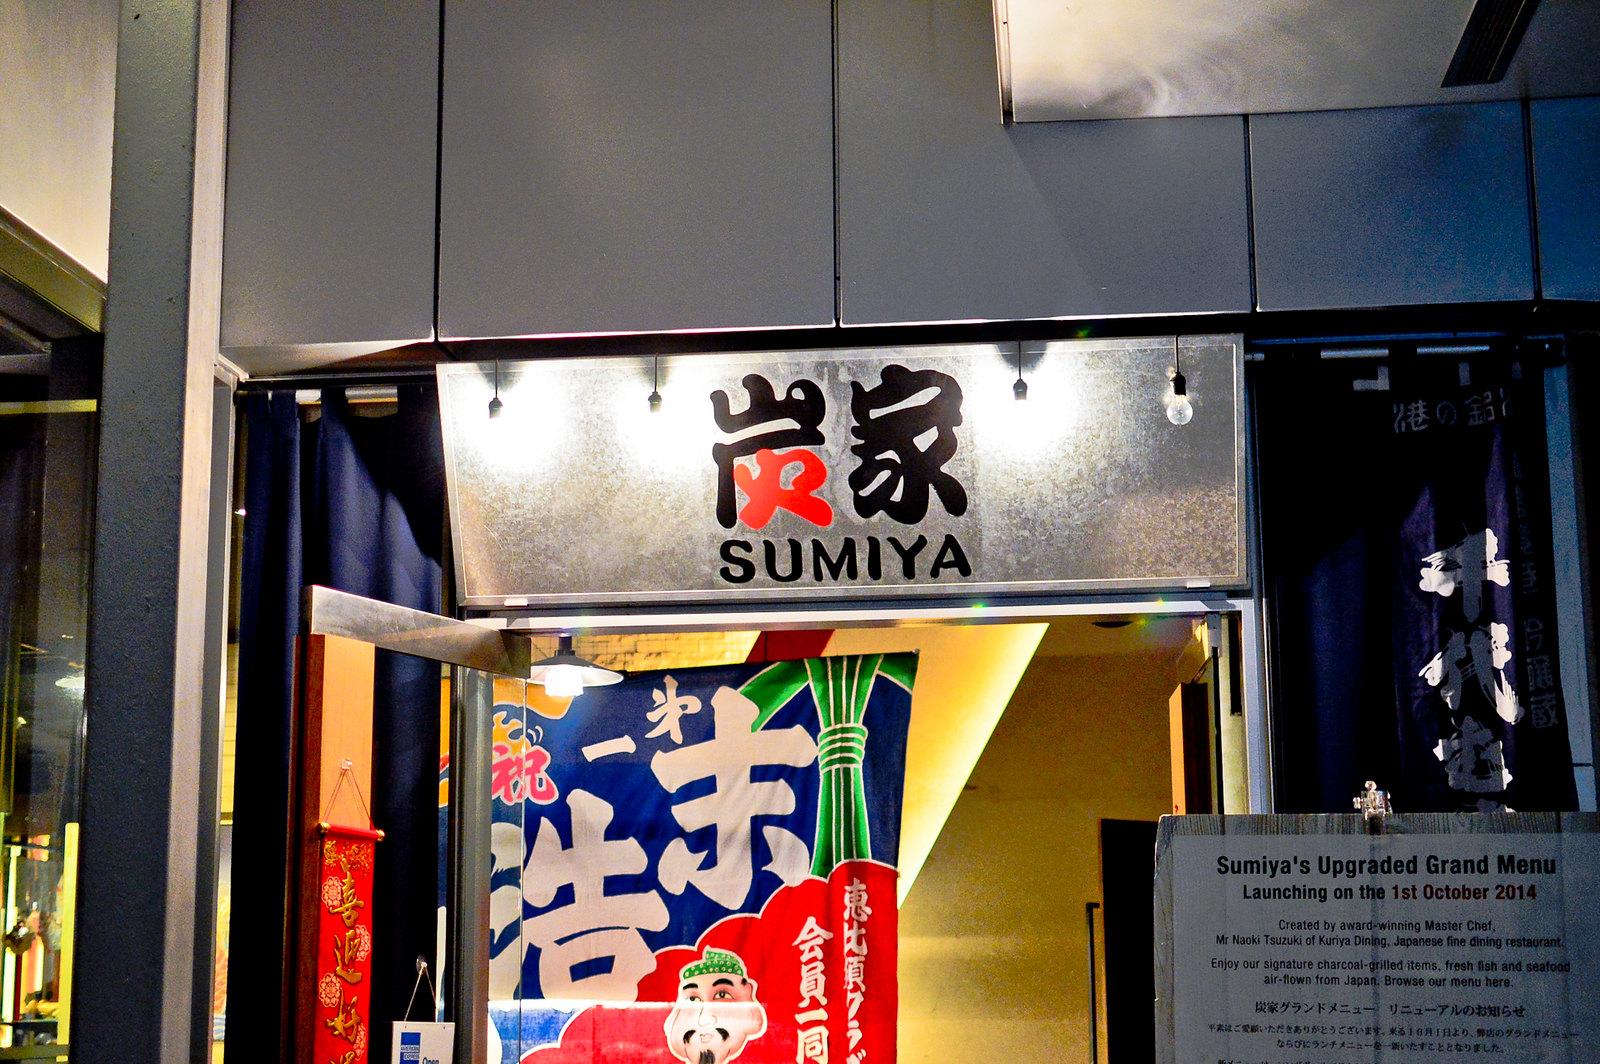 Sumiya Charcoal Grill Izakaya